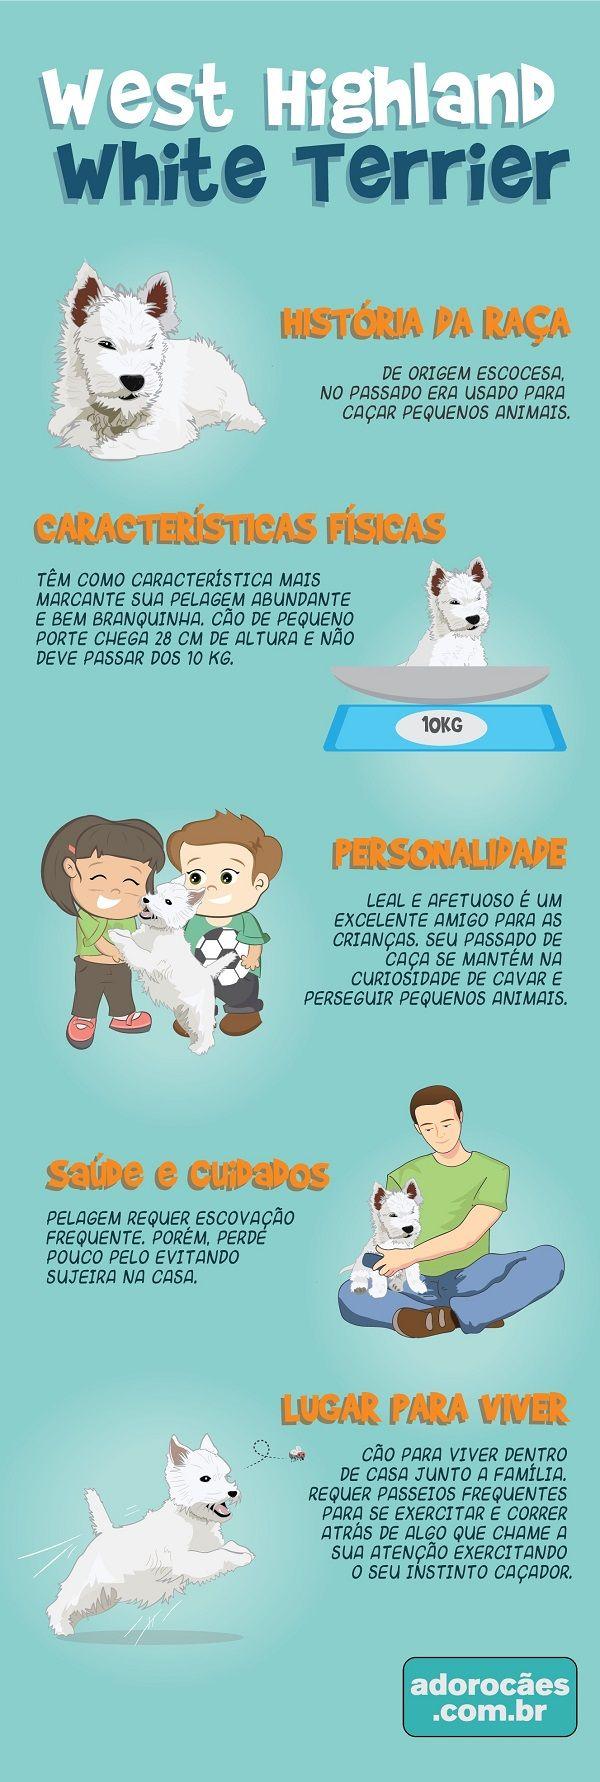 West Highland White Terrier: história da raça, características físicas, personalidade, temperamento, saúde e cuidados, lugar para viver